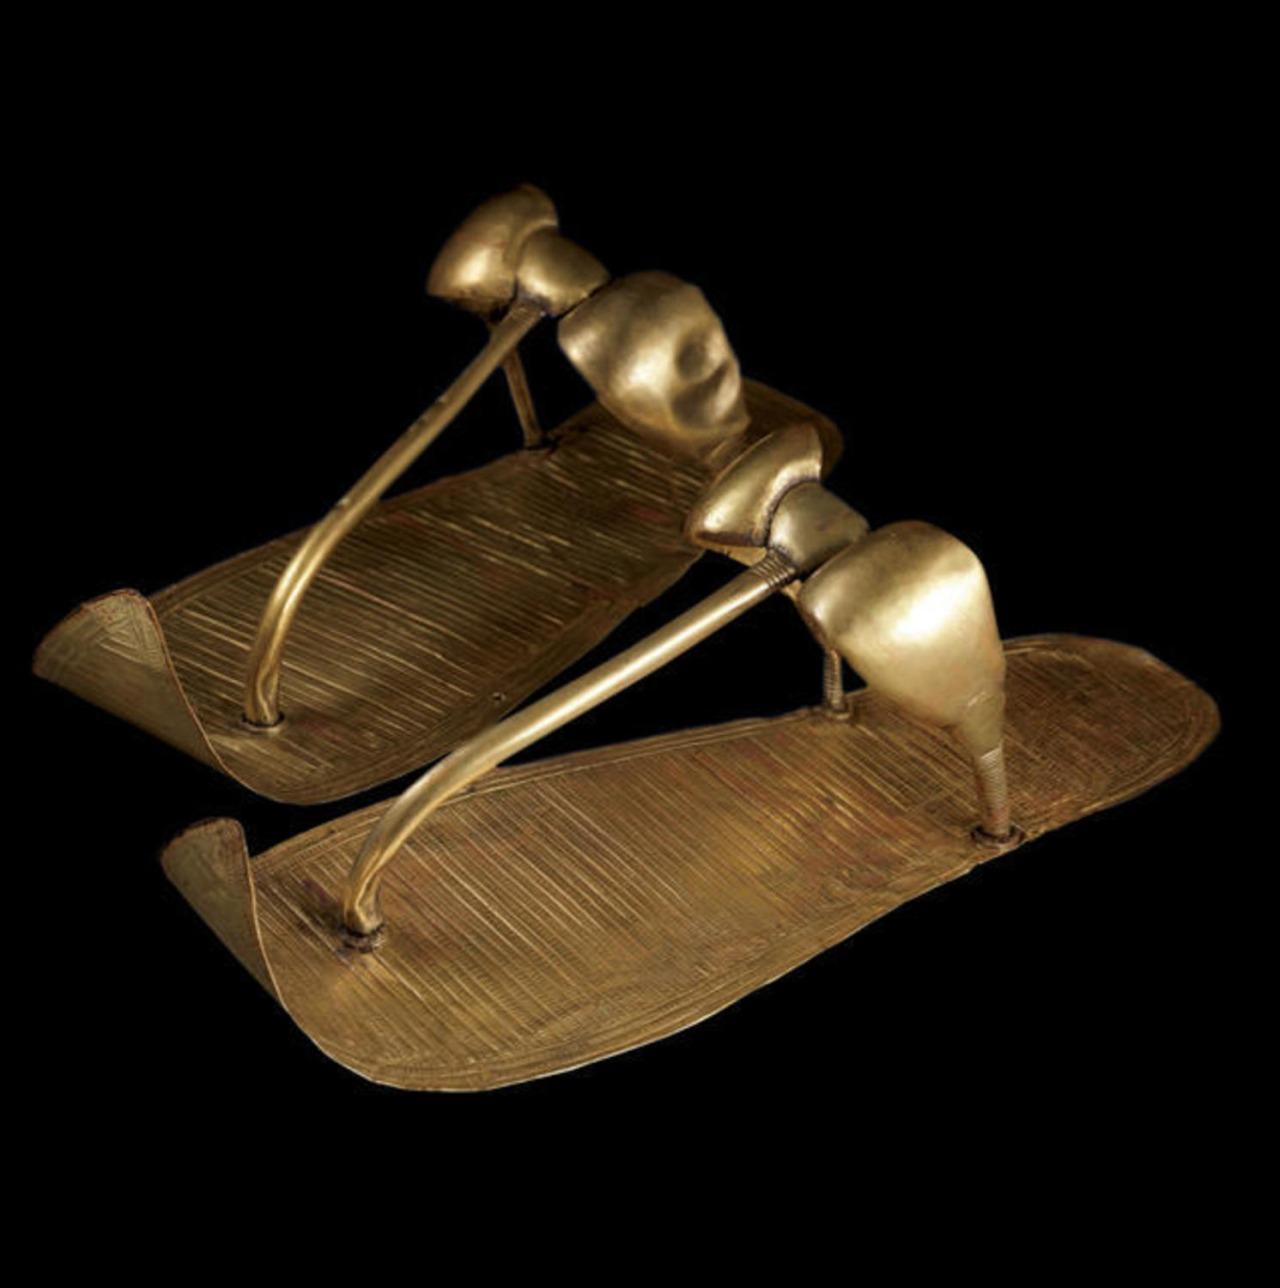 Tutankhamun's golden sandals